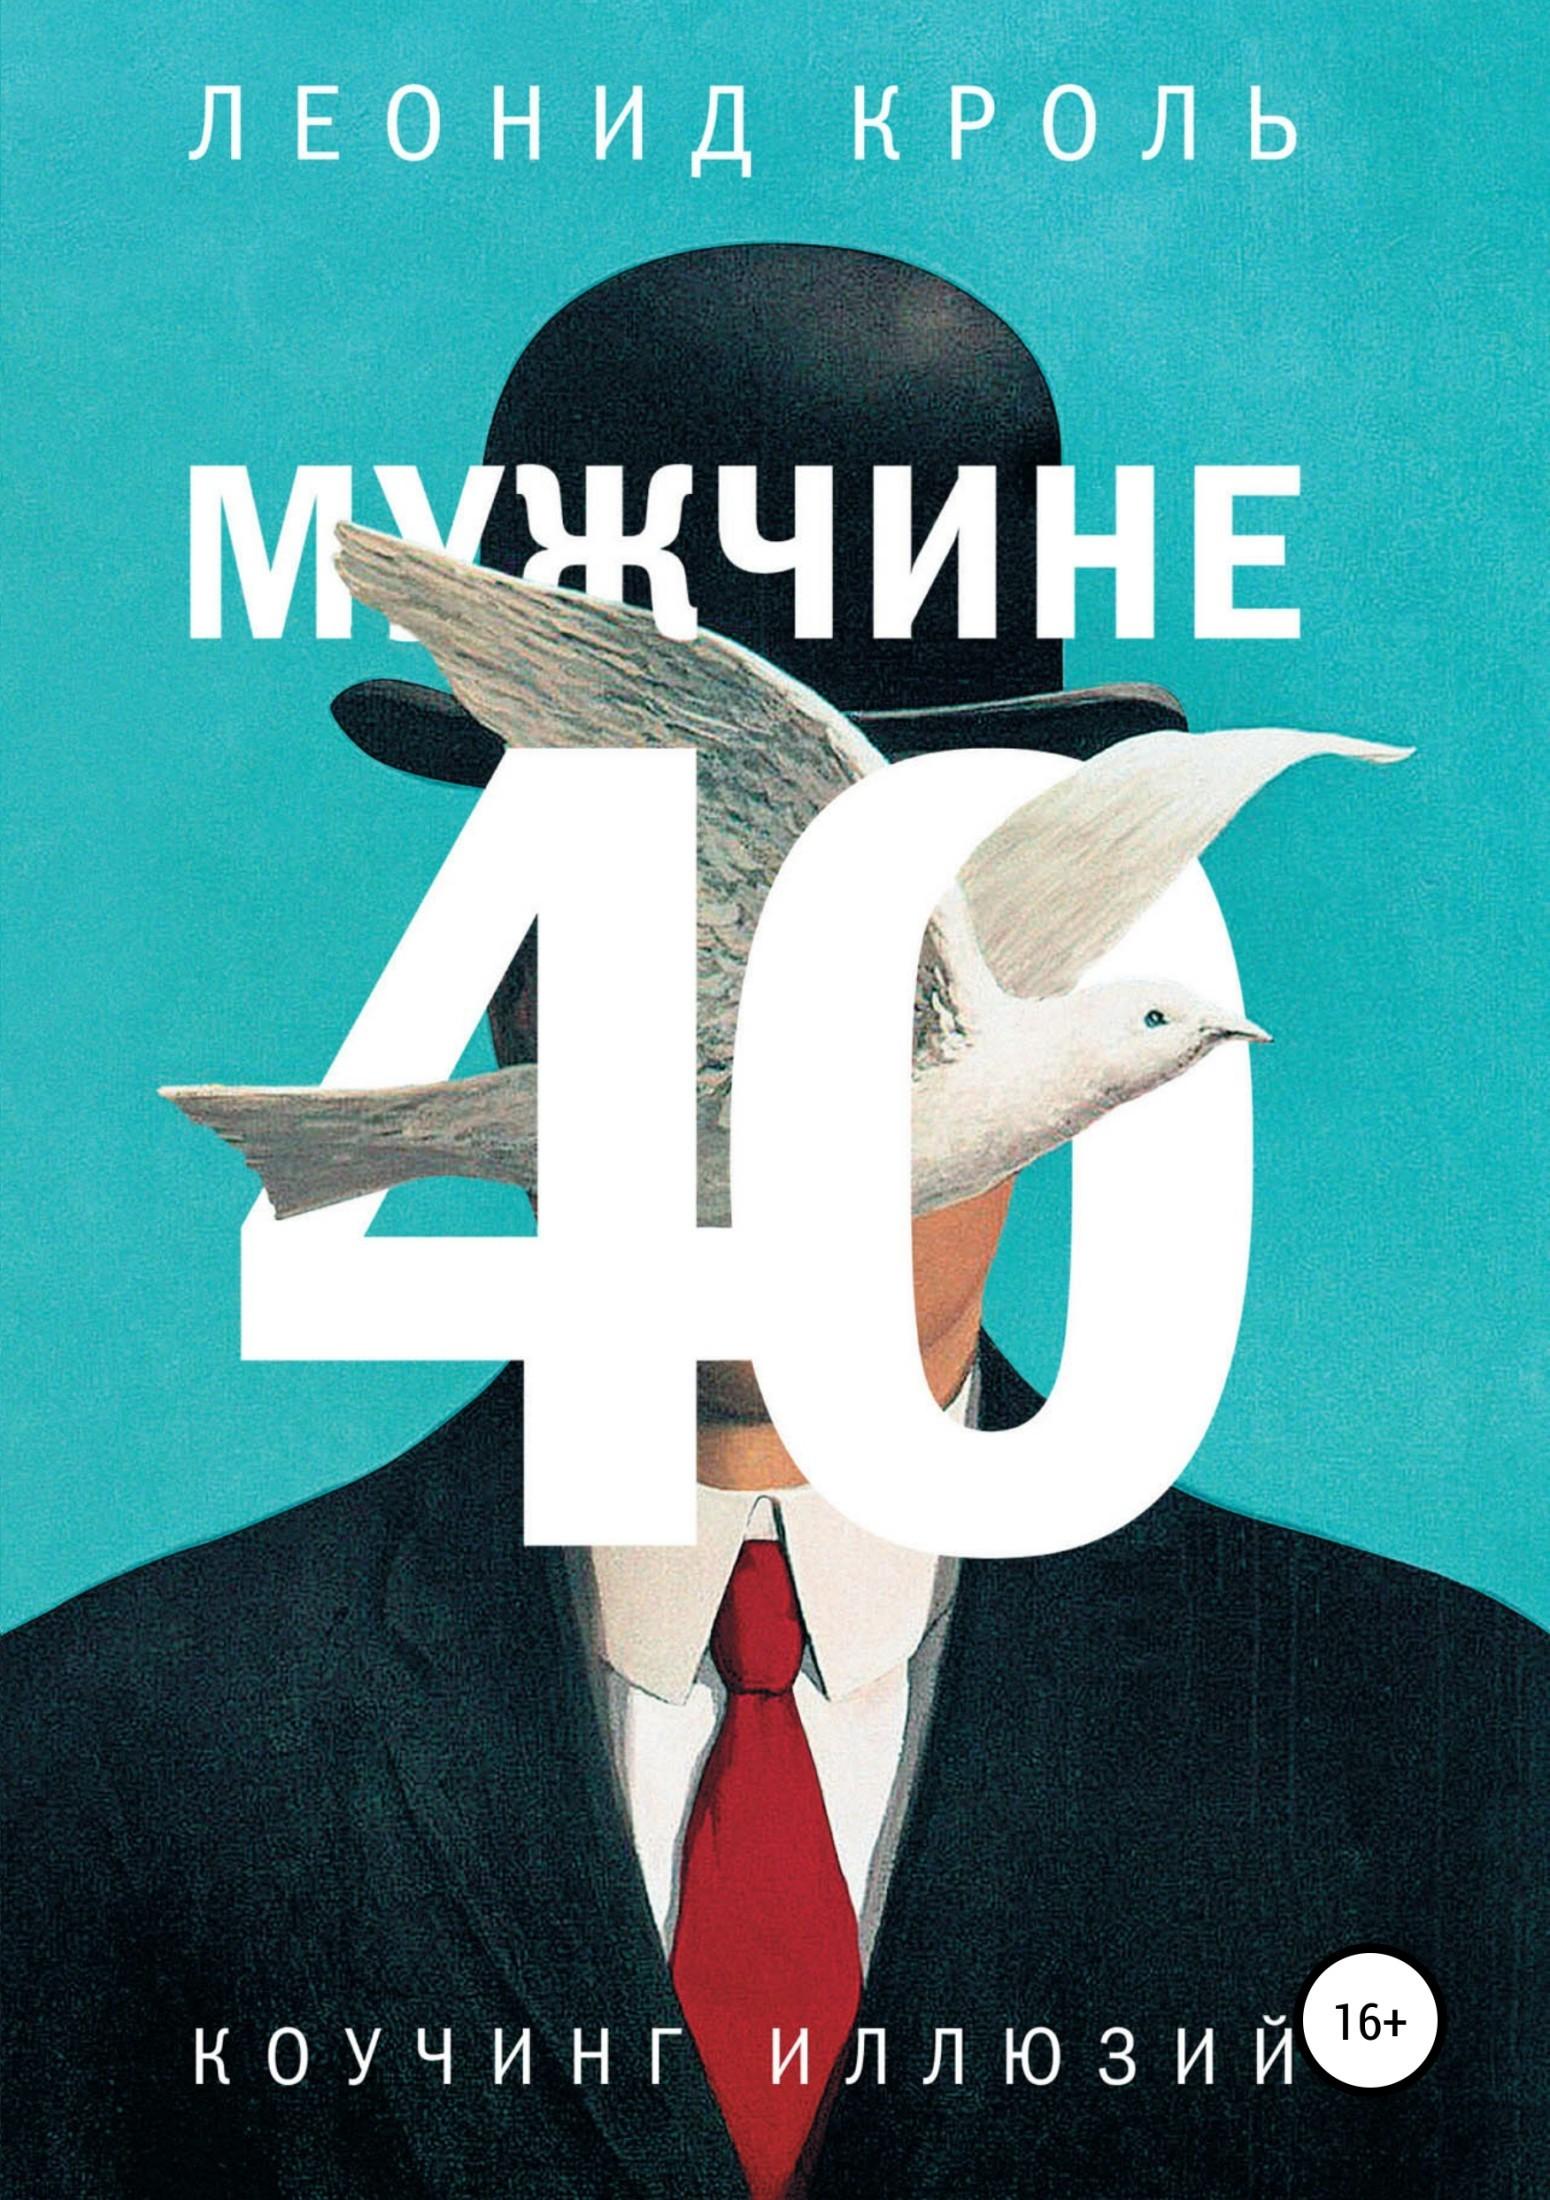 Обложка книги Мужчине 40. Коучинг иллюзий